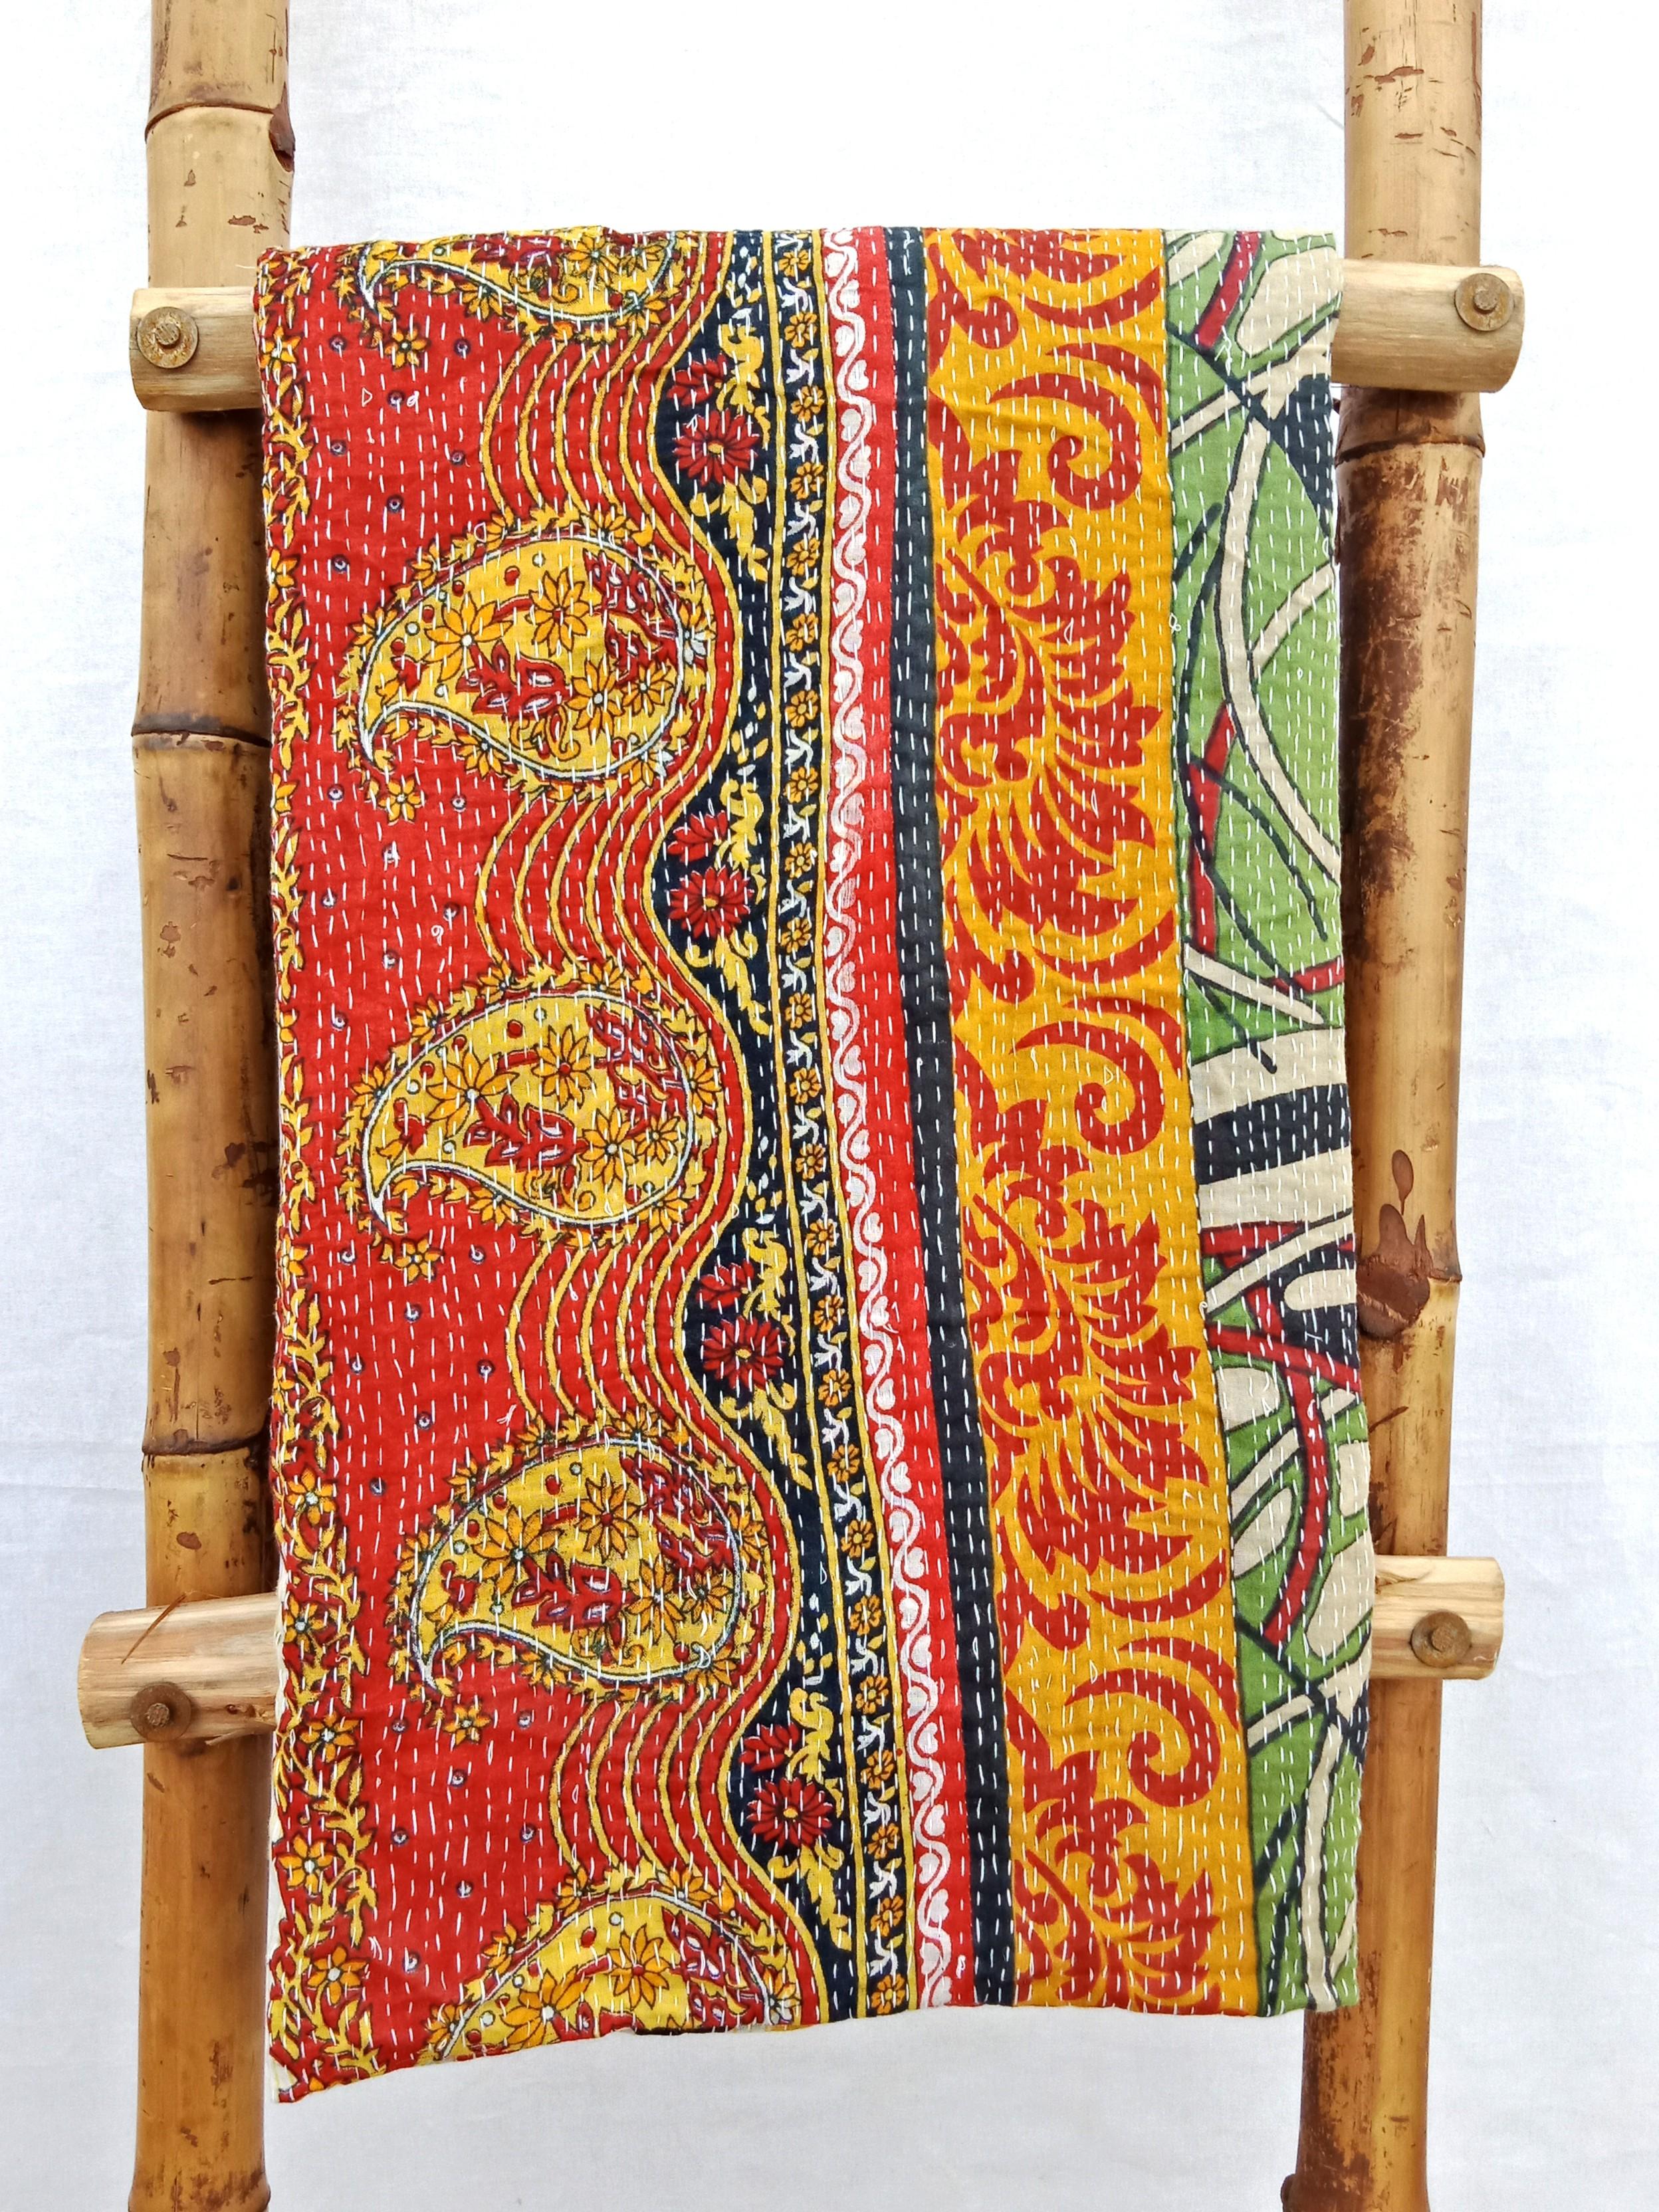 2 layered Close Stitched Kantha Quilt